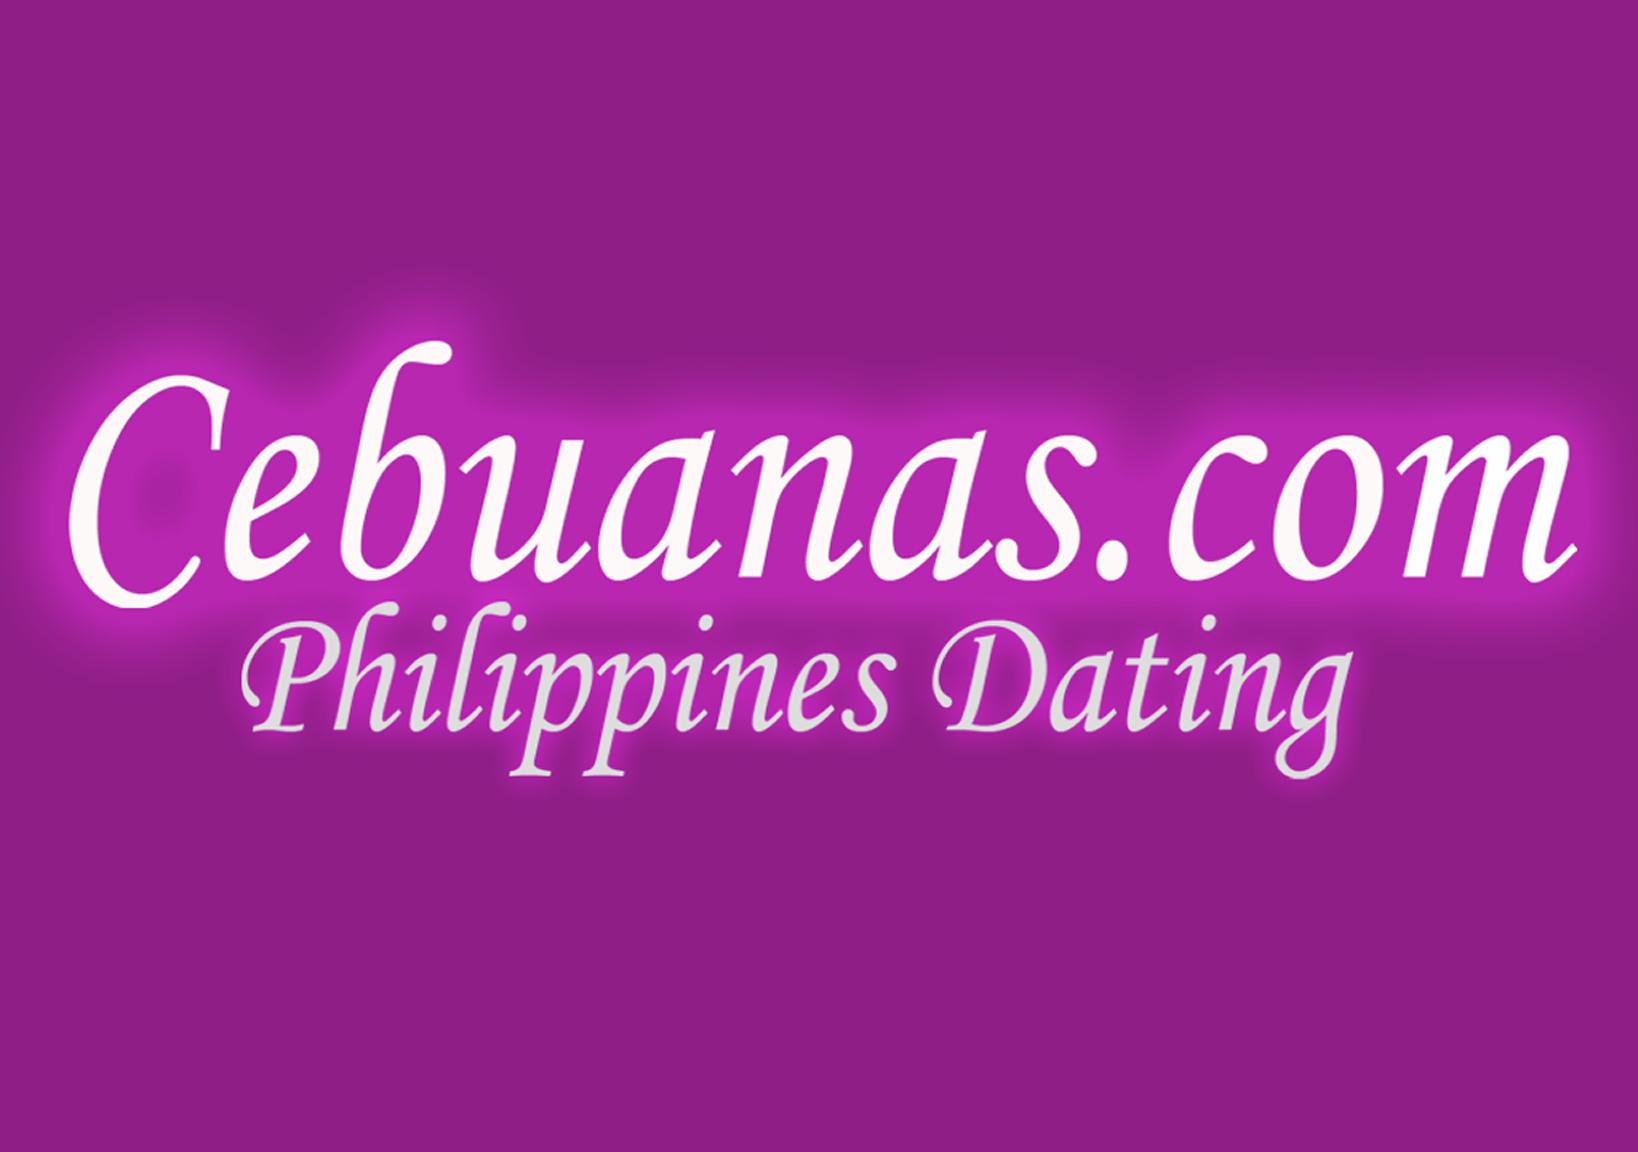 Philippines dating cebuanas.com sugar daddies online dating